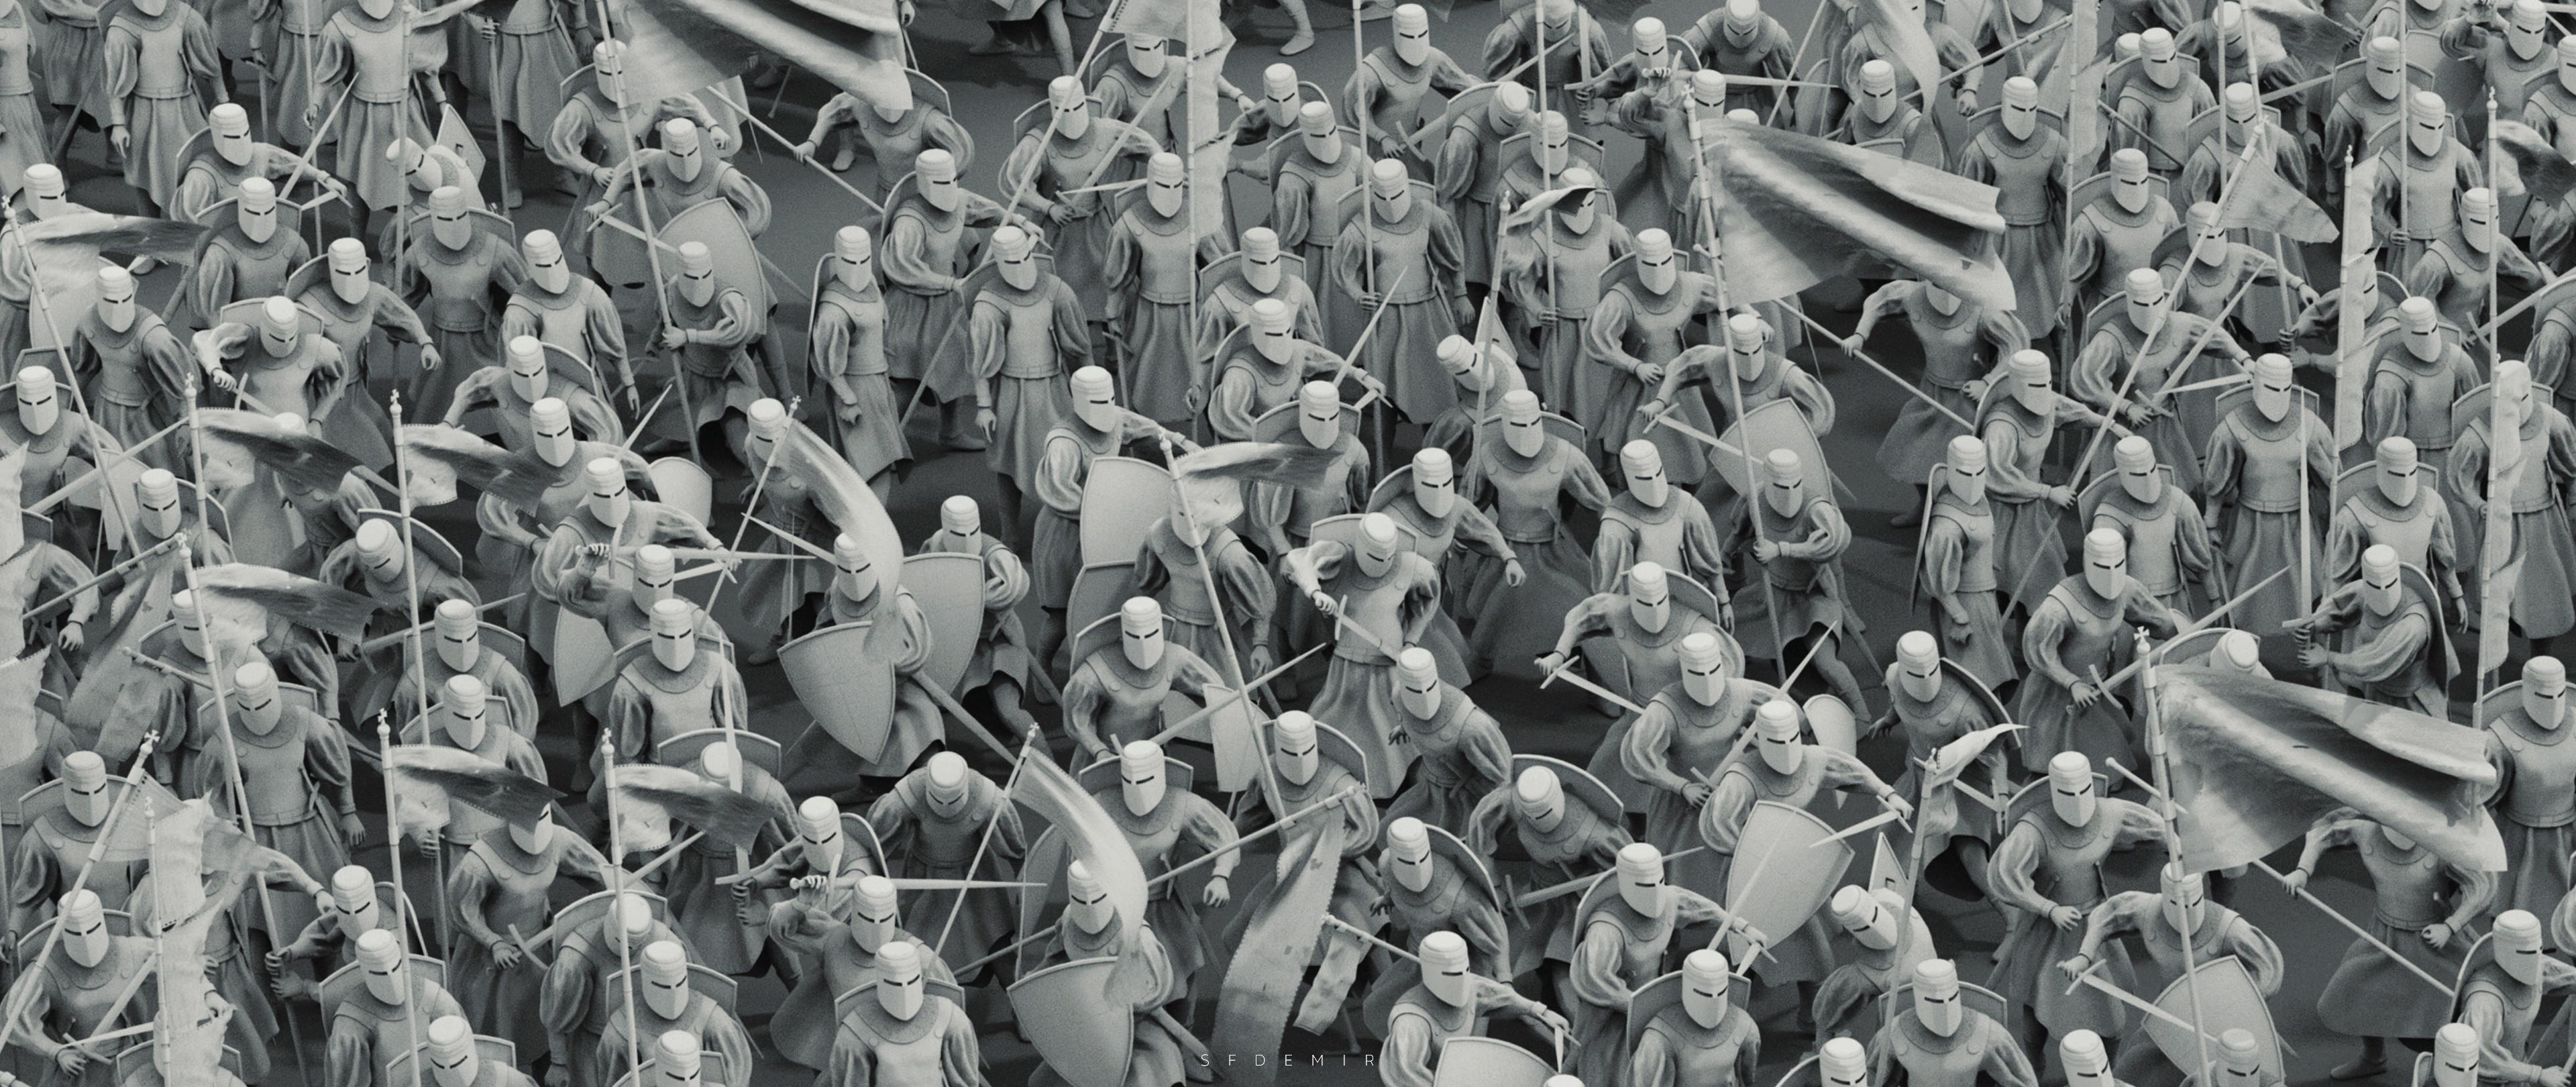 Preparing For War Scene - Shot 02 - Clay Render